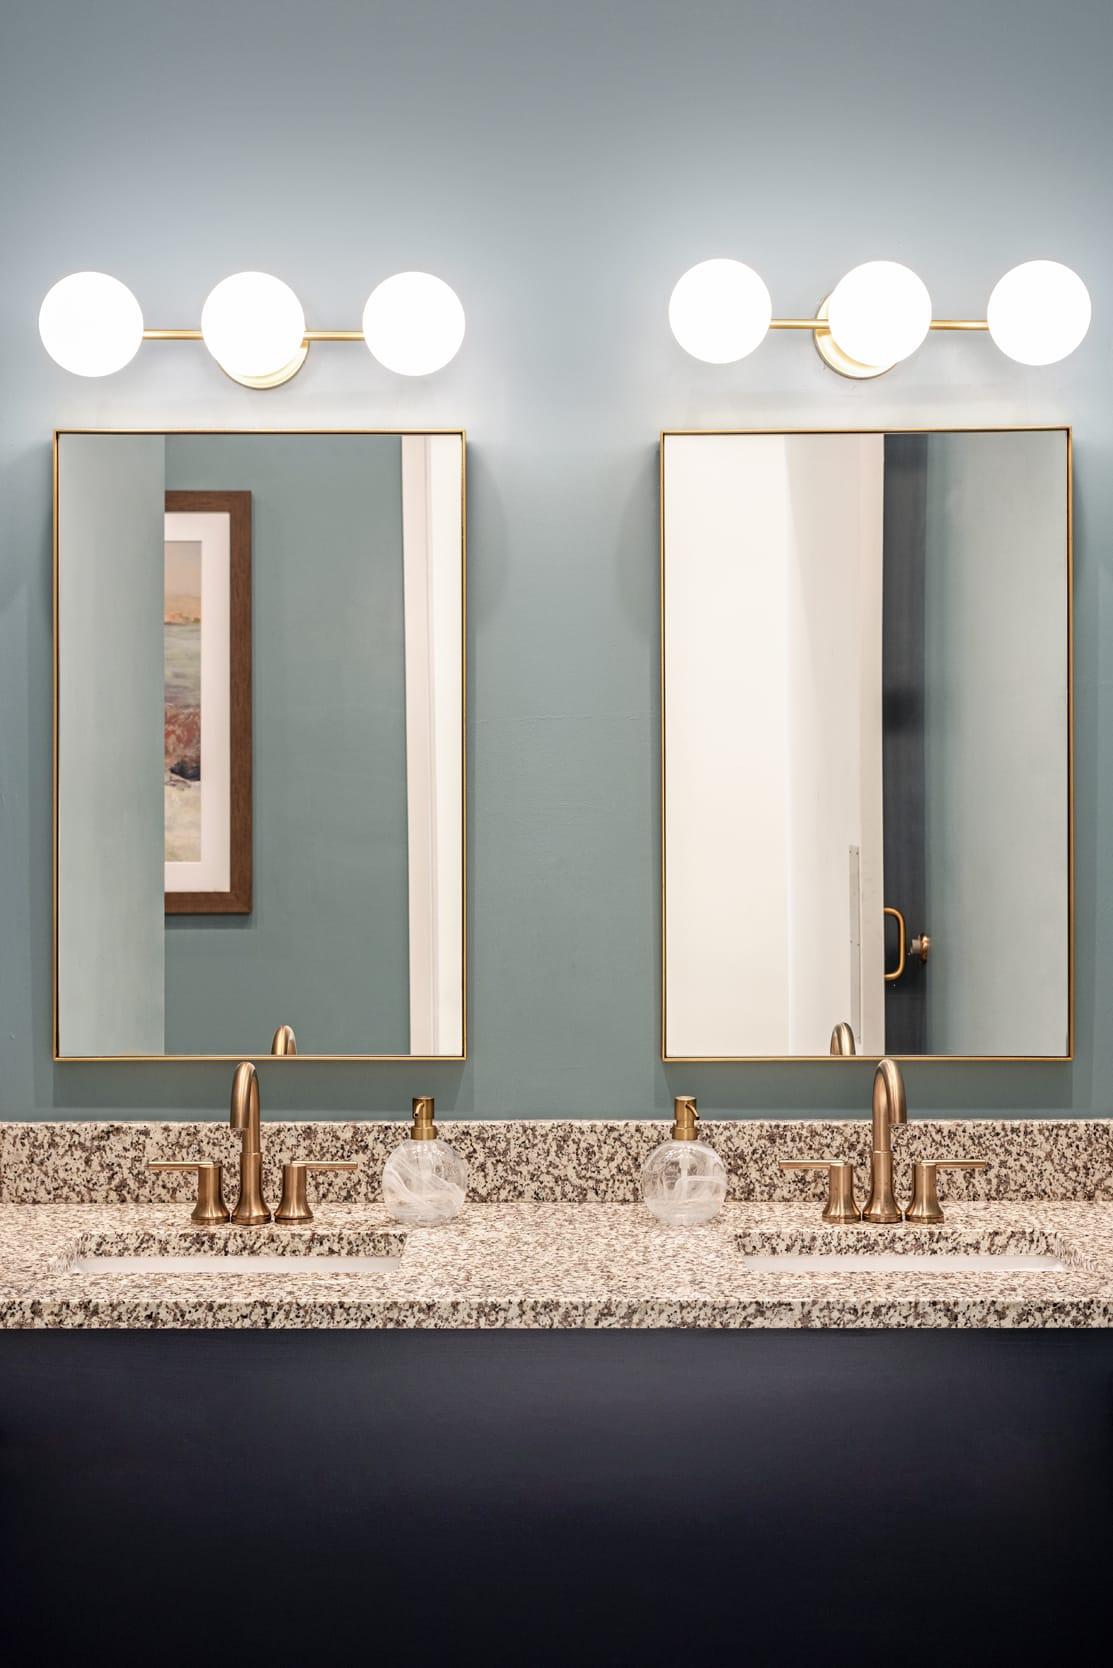 Studio121 Savona Club House Bathroom Sink Area